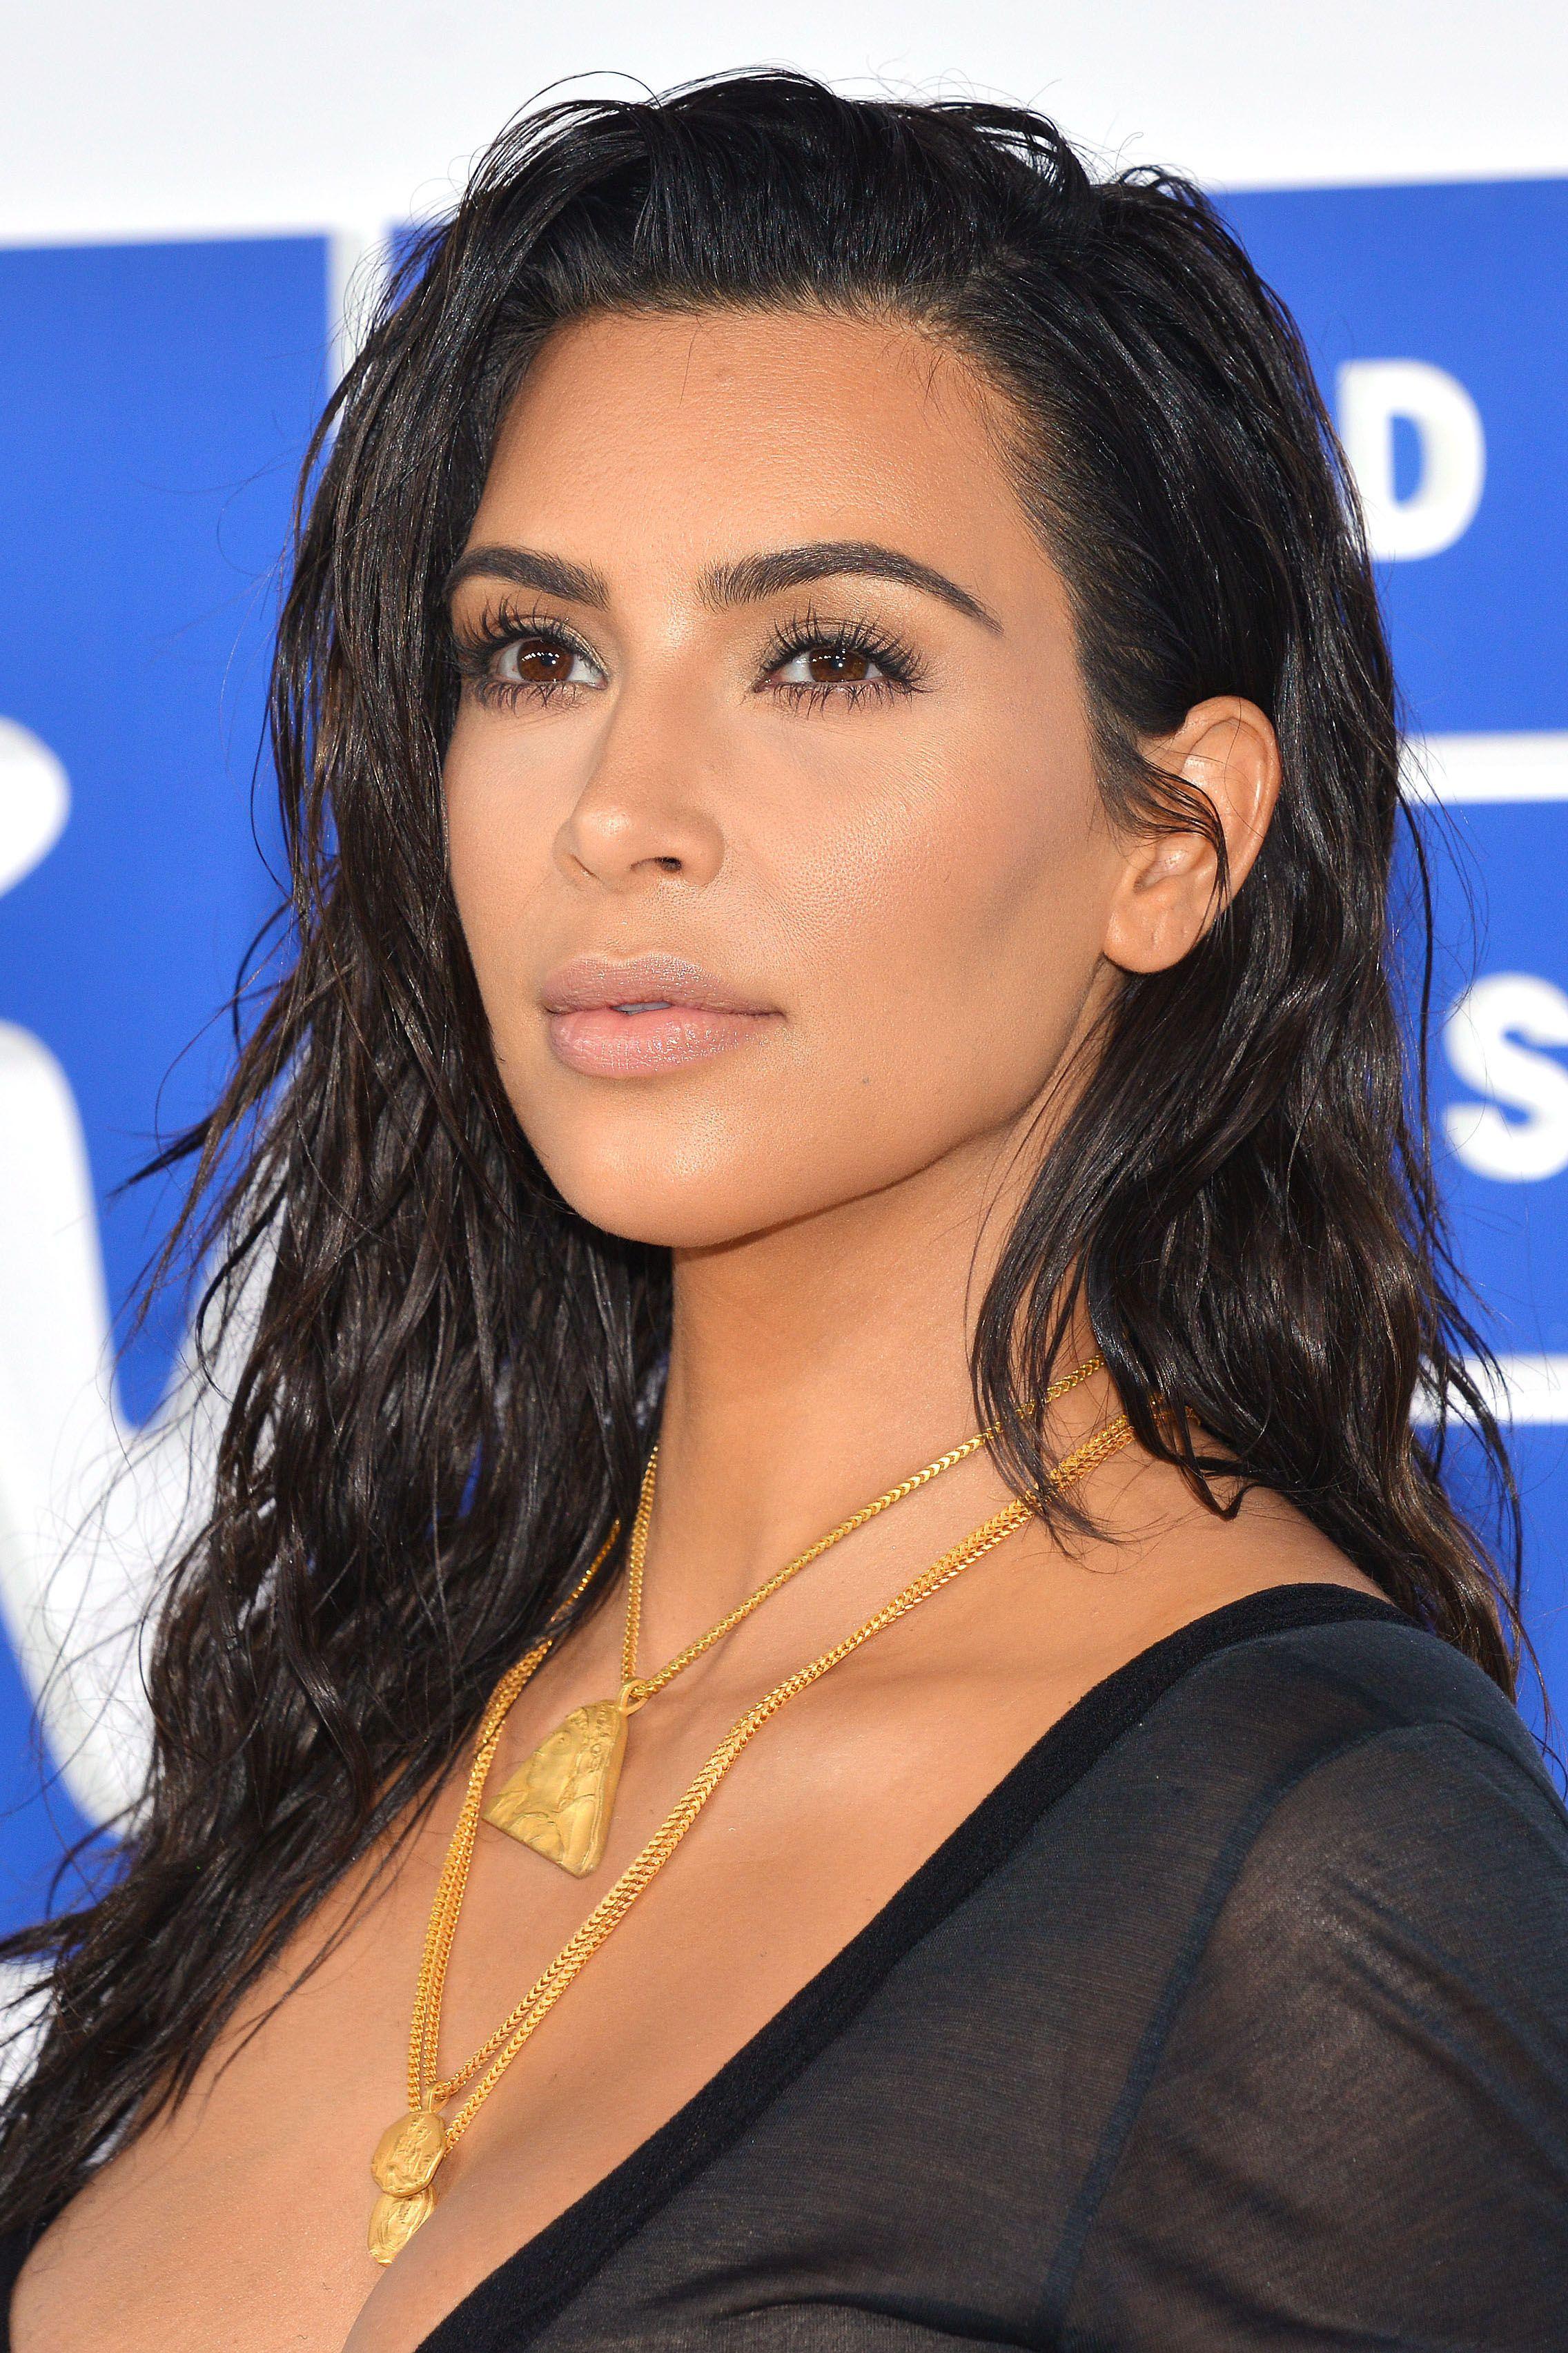 Kim Kardashian Showing Pussy photo 4